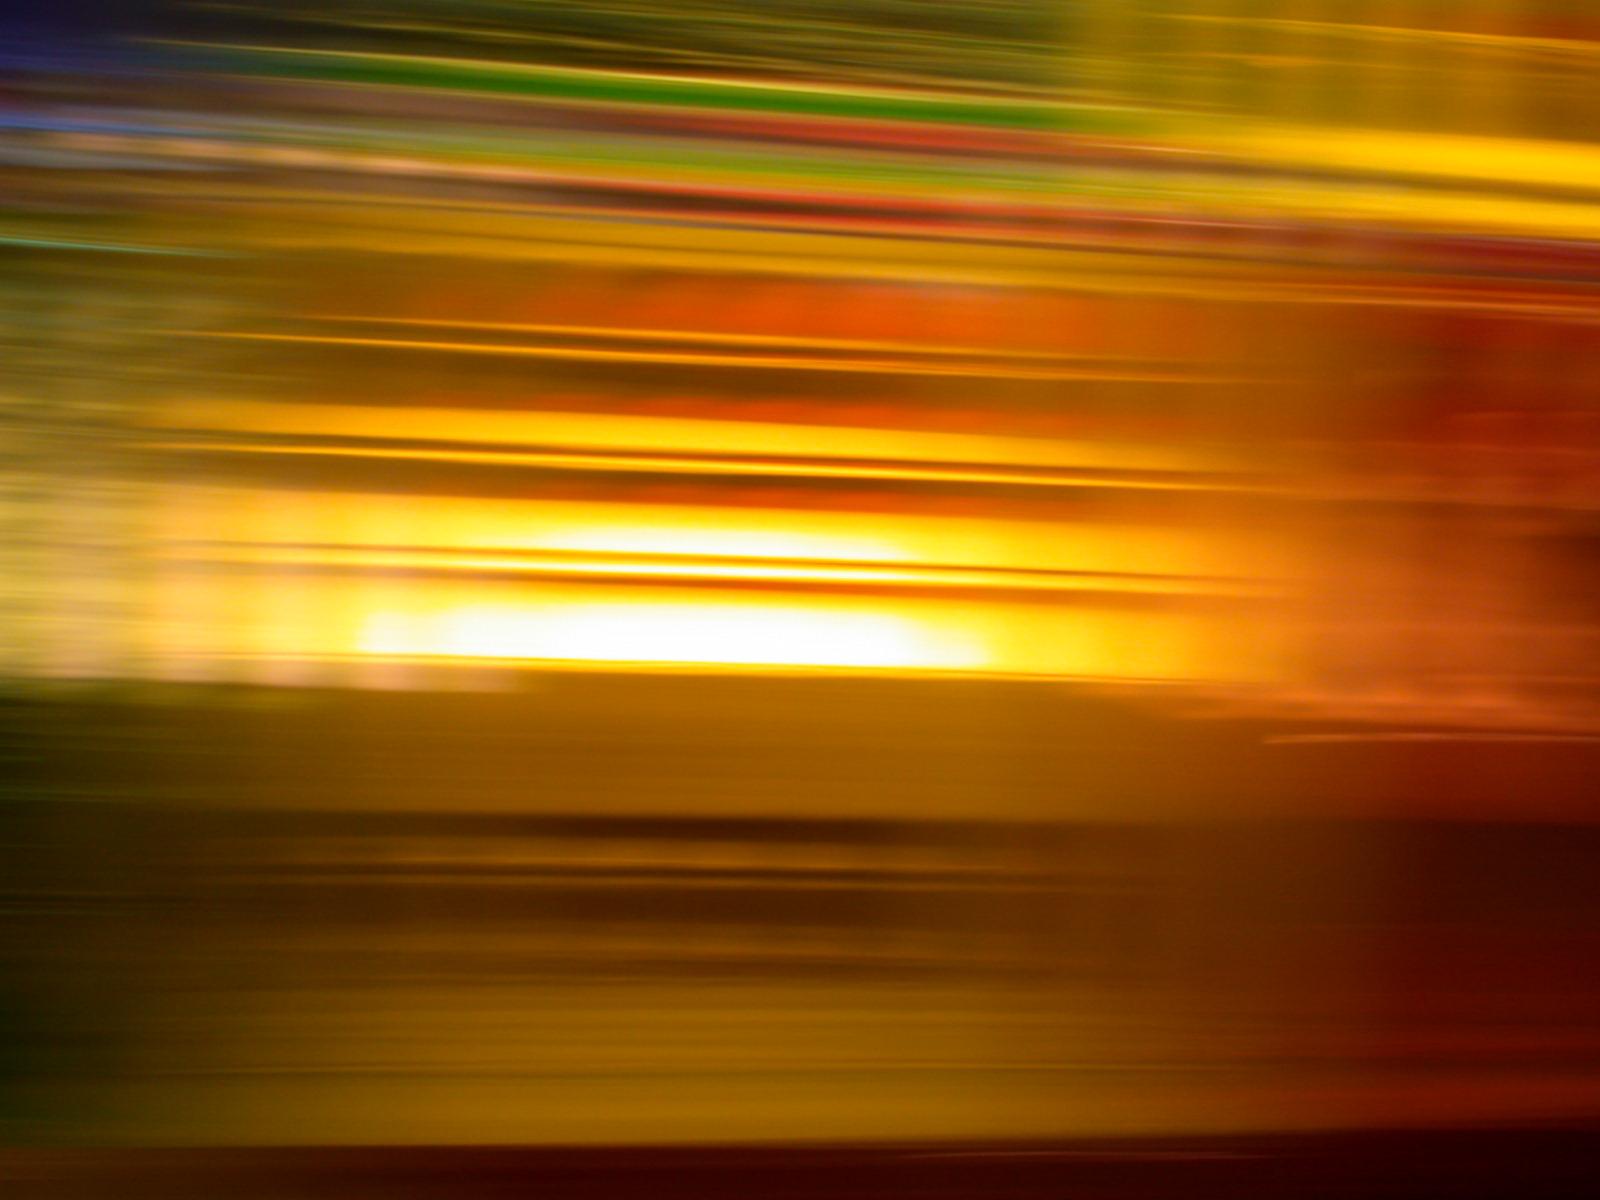 orange blur yellow light flash speed